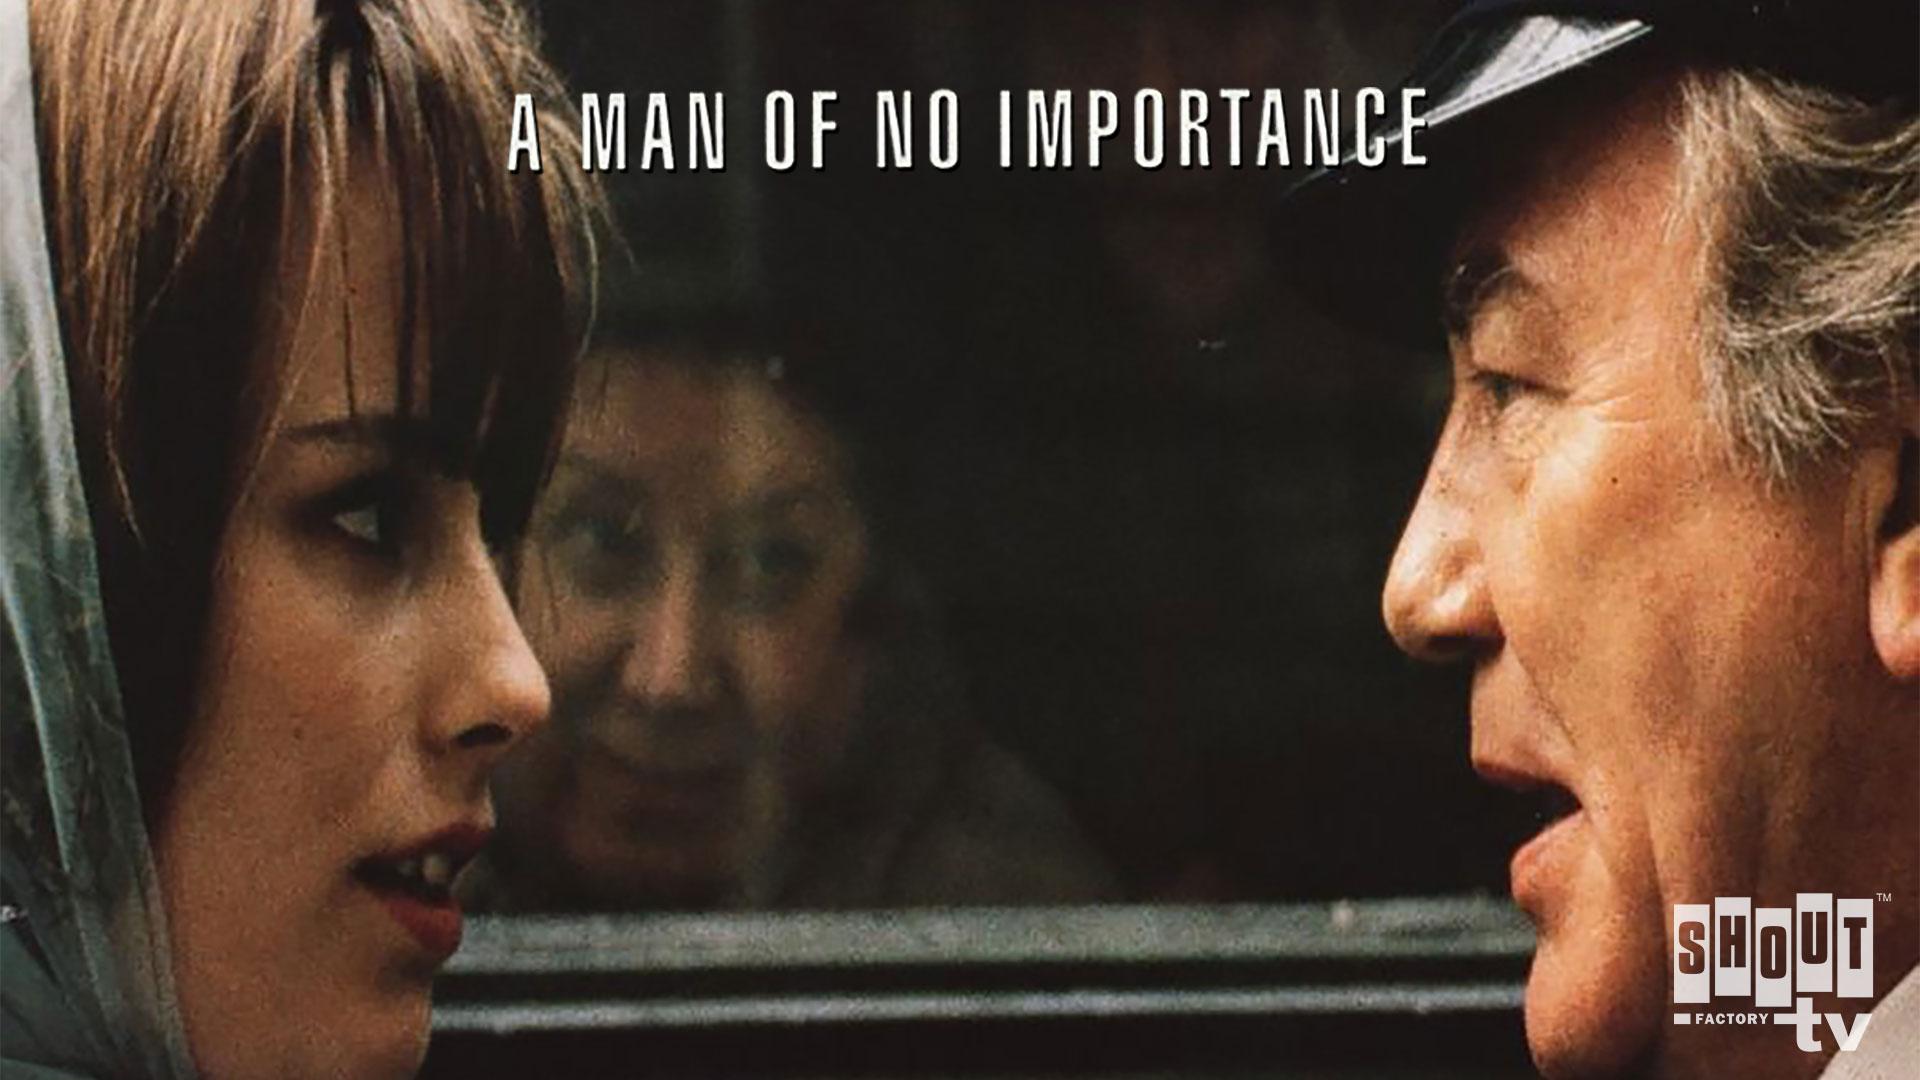 A Man Of No Importance